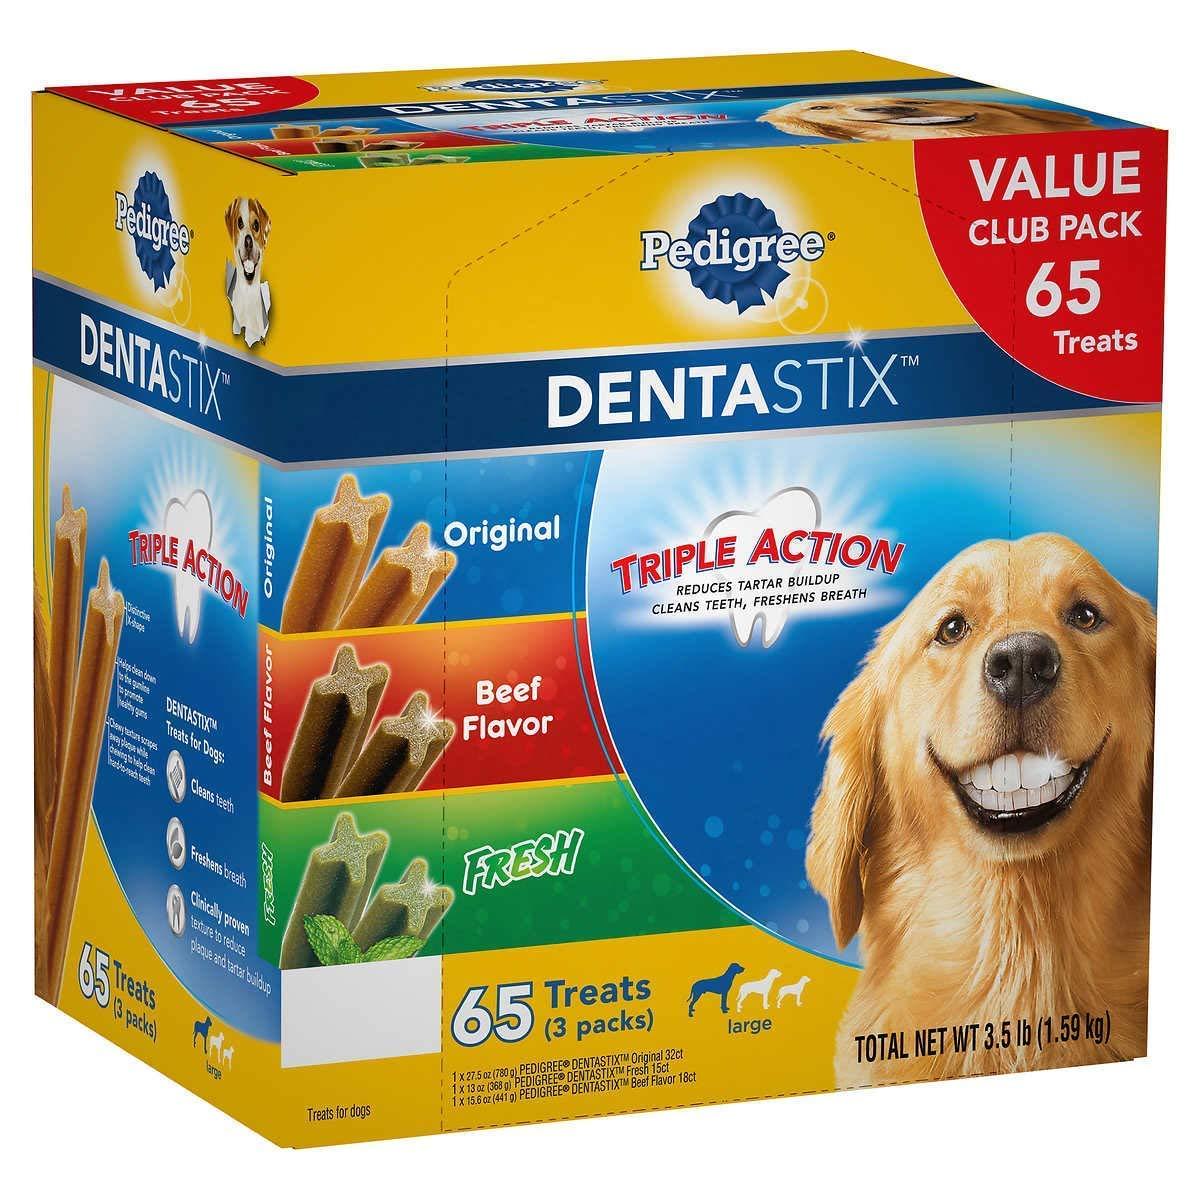 Pedigree Dentastix Treats Variety Pack (65Count/ 3.5 Lbs), 3.5 Lb by Pedigree